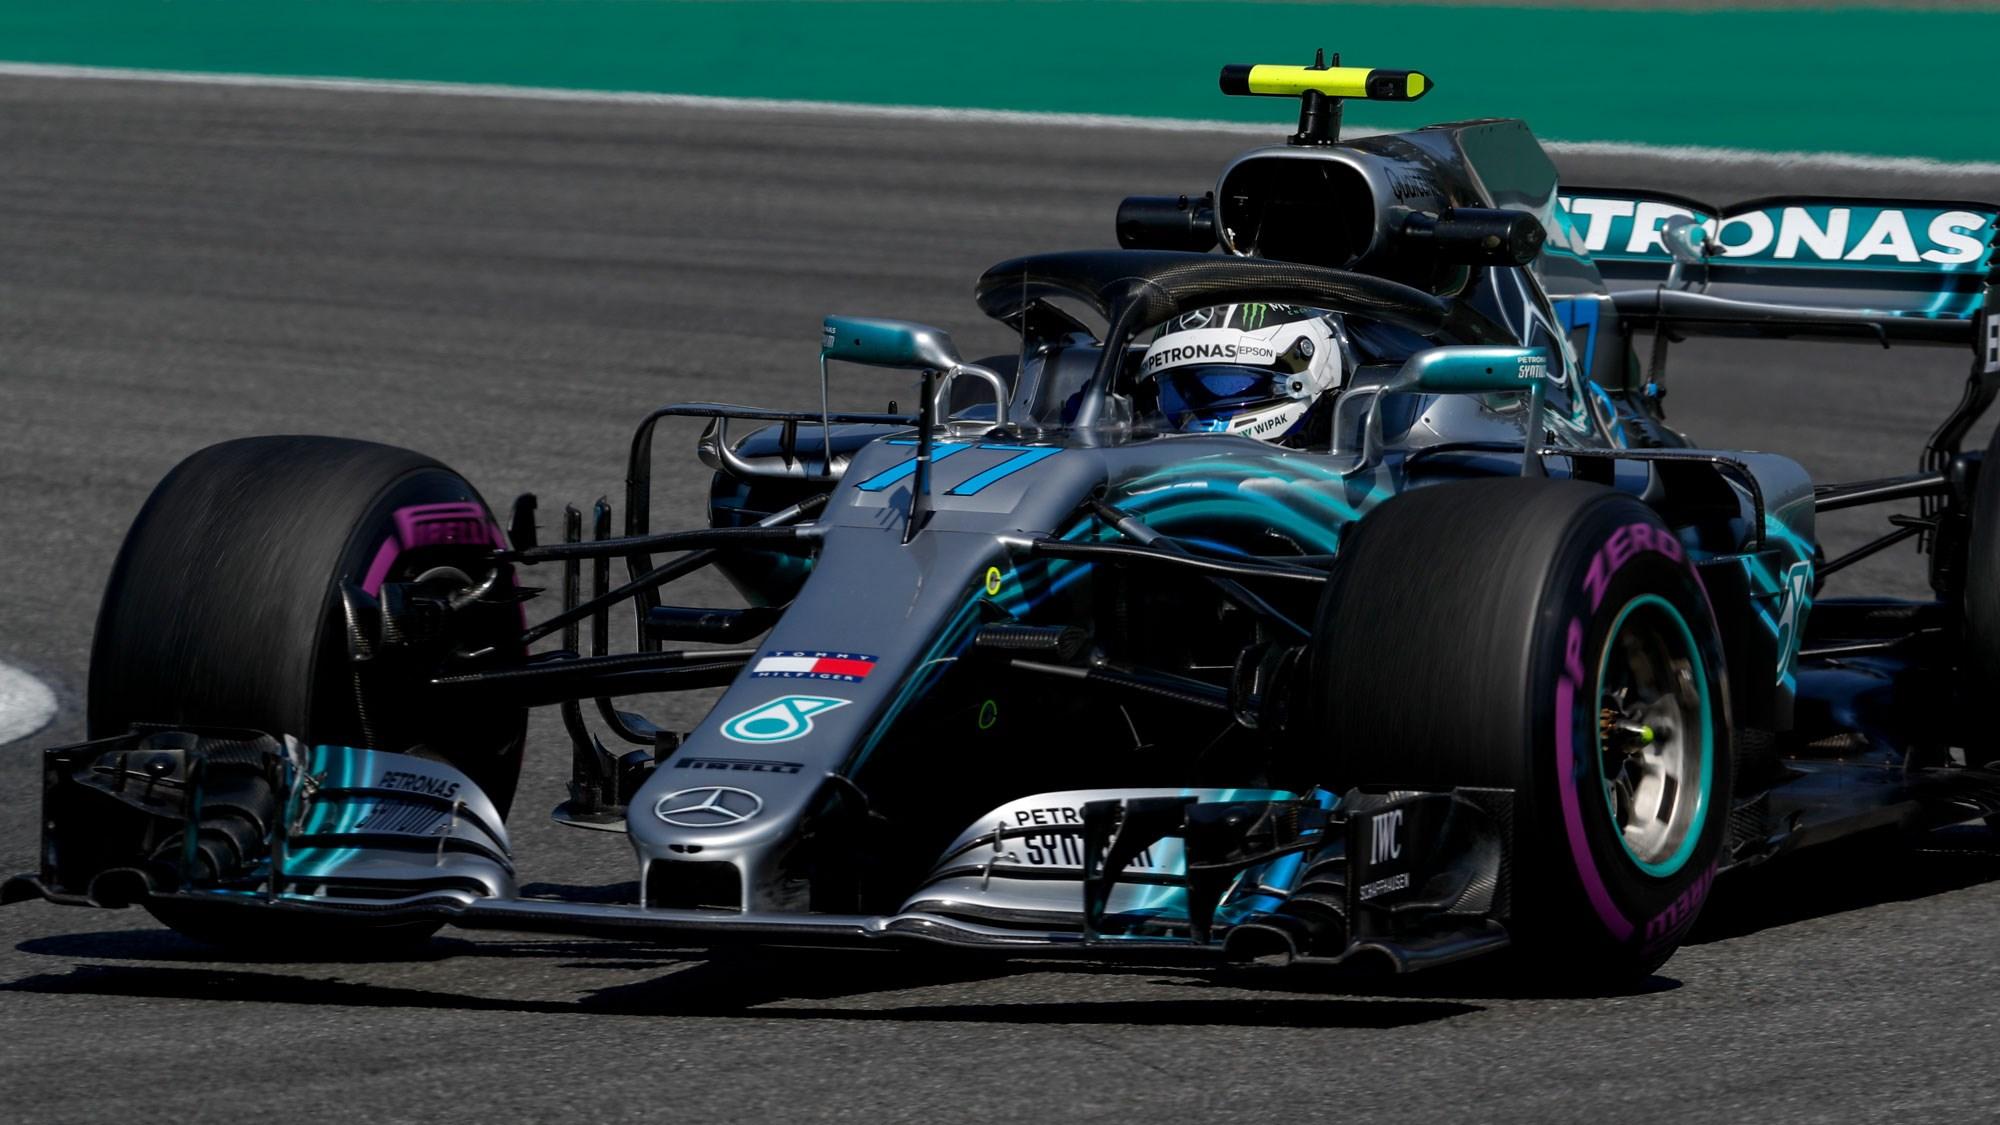 F1: F1 2018: Valtteri Bottas' Guide To Tyre Management